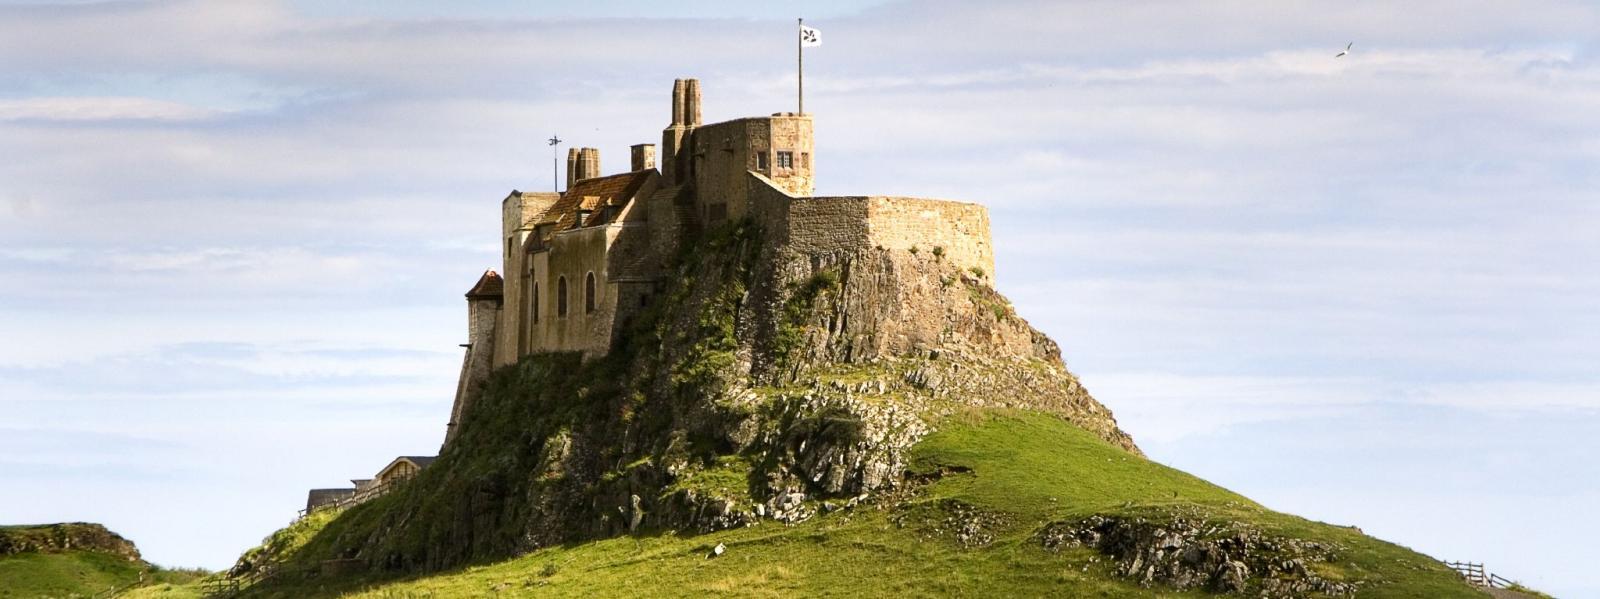 Lindisfarne Castle, Holy Island, England